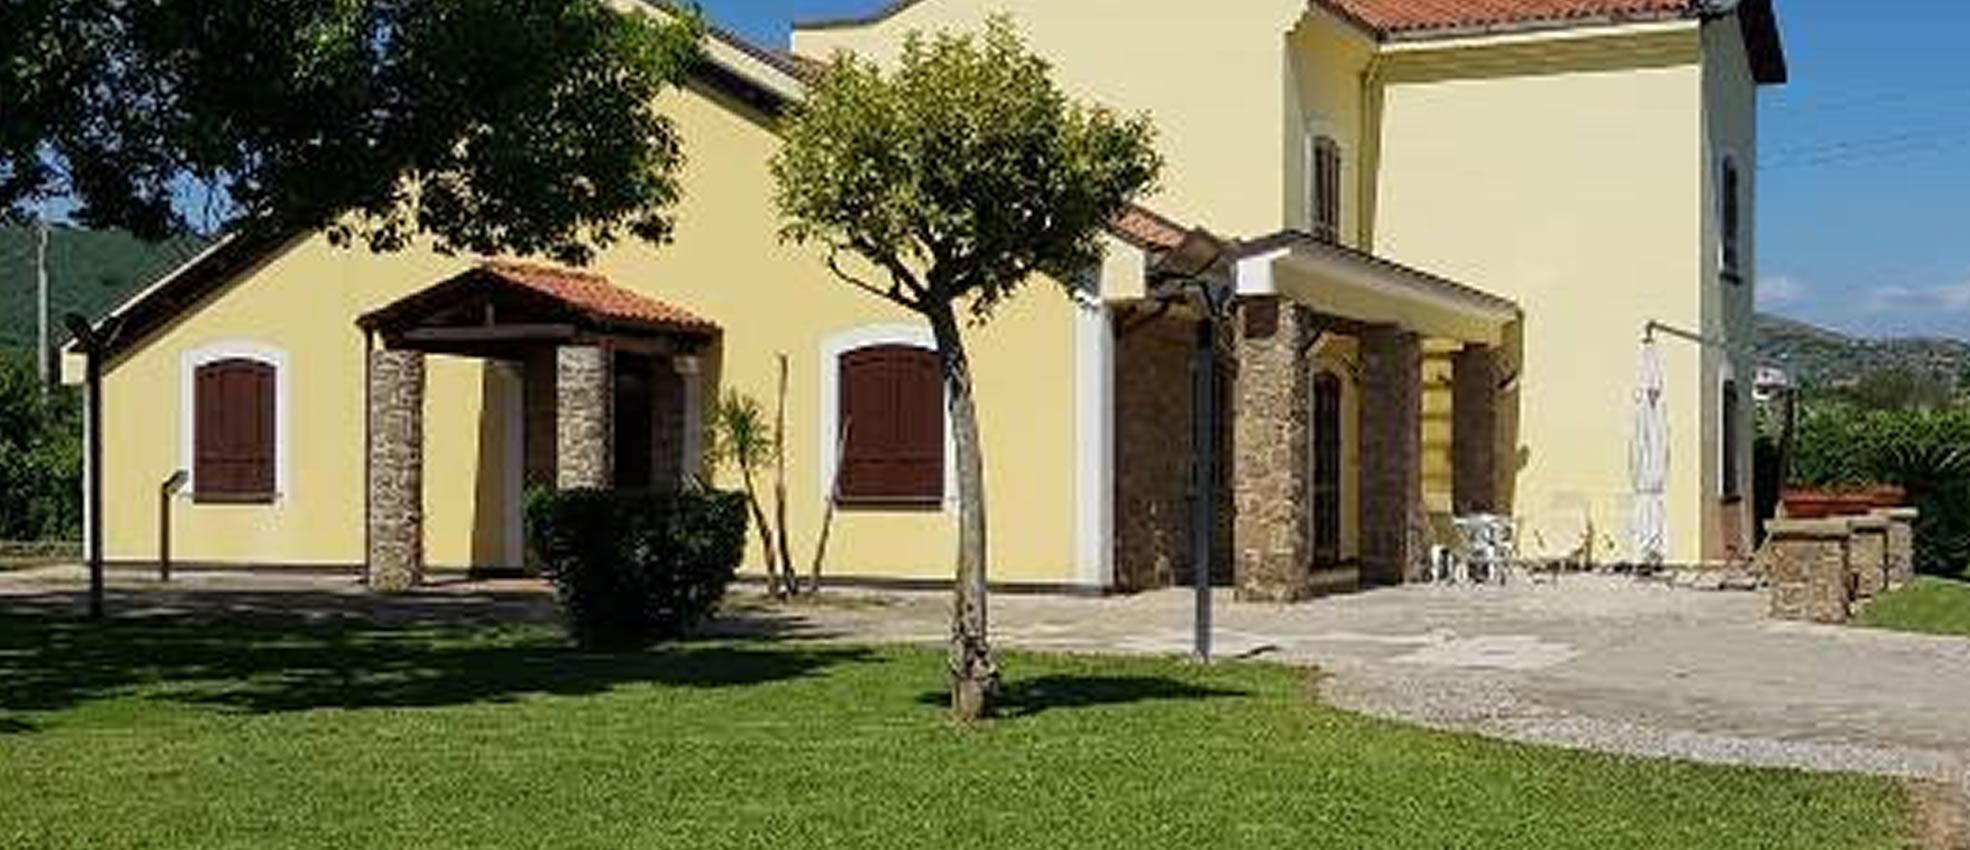 Villa prestigiosa con giardino rif. 4750